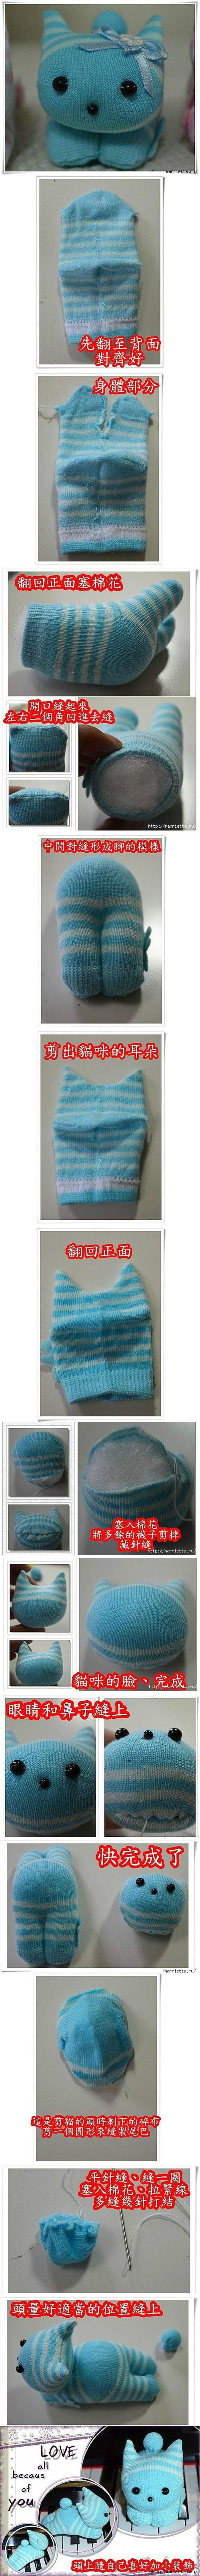 DIY Cute Sock Kitten DIY Projects | UsefulDIY.com